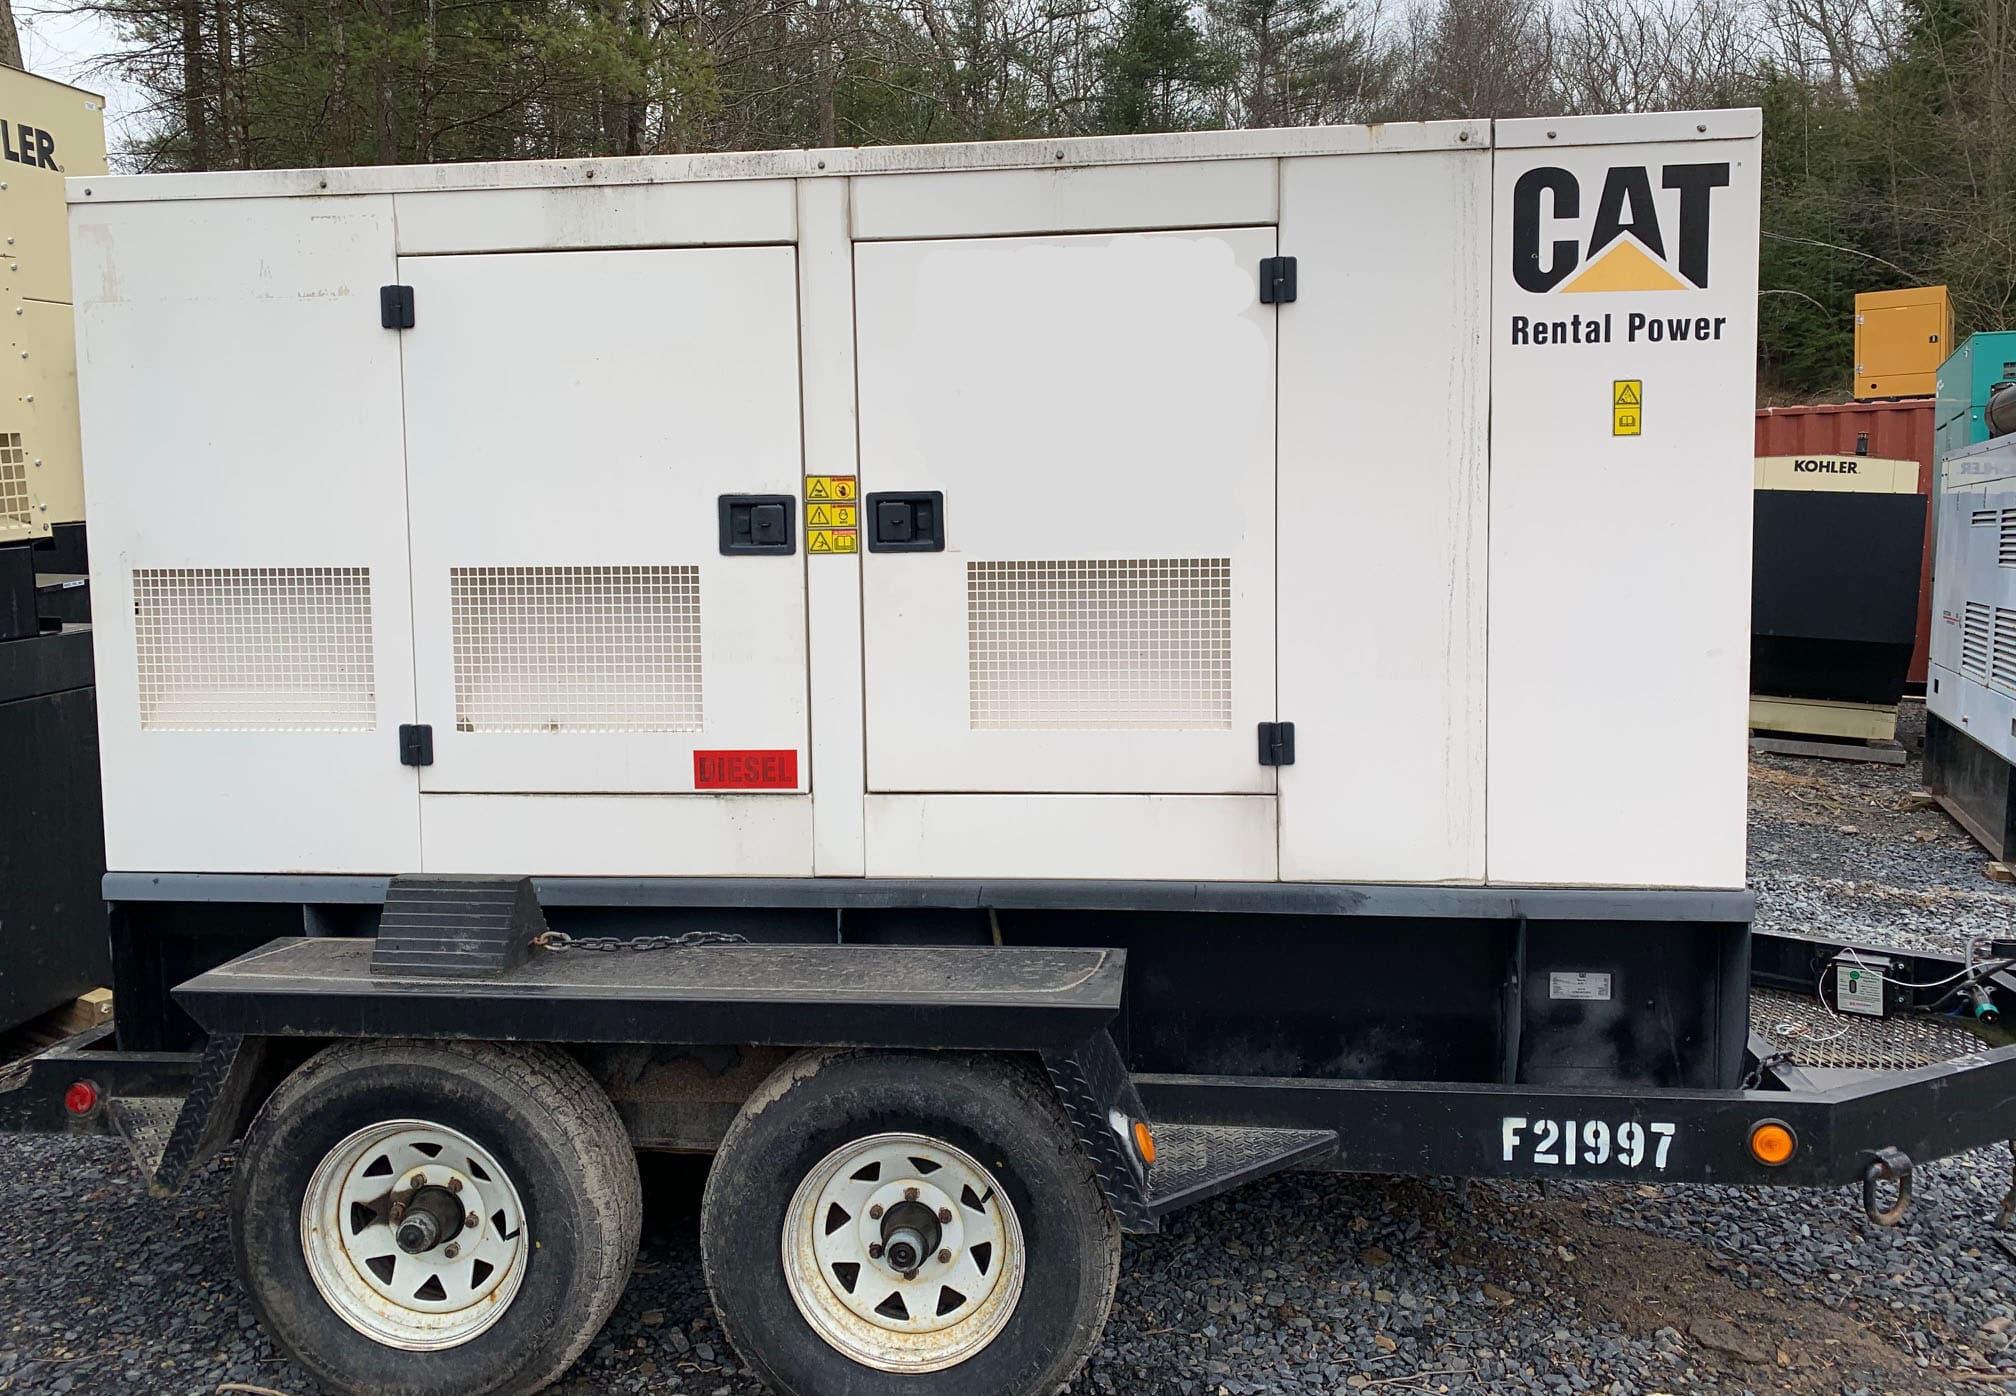 Used 100 kW CAT XQ100-4 Portable Diesel Generator – ON RENT